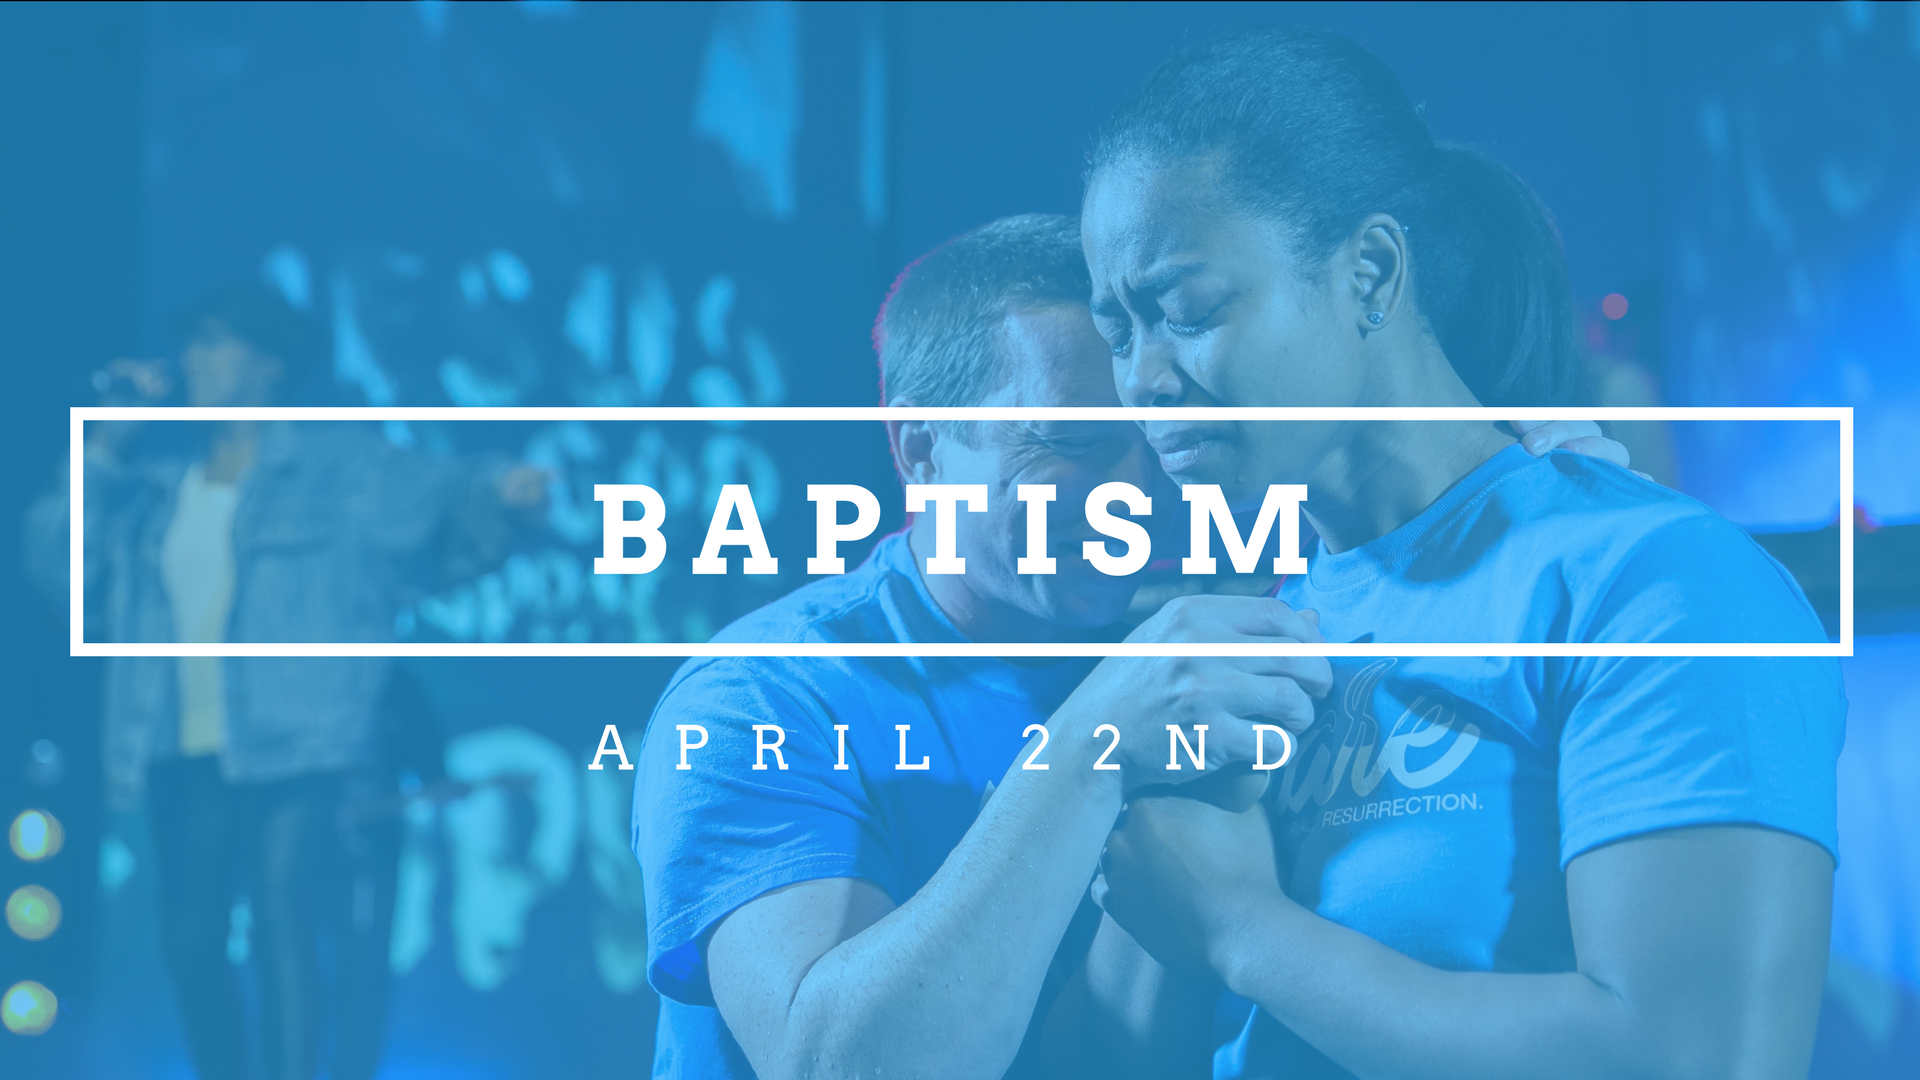 Baptism at ignite